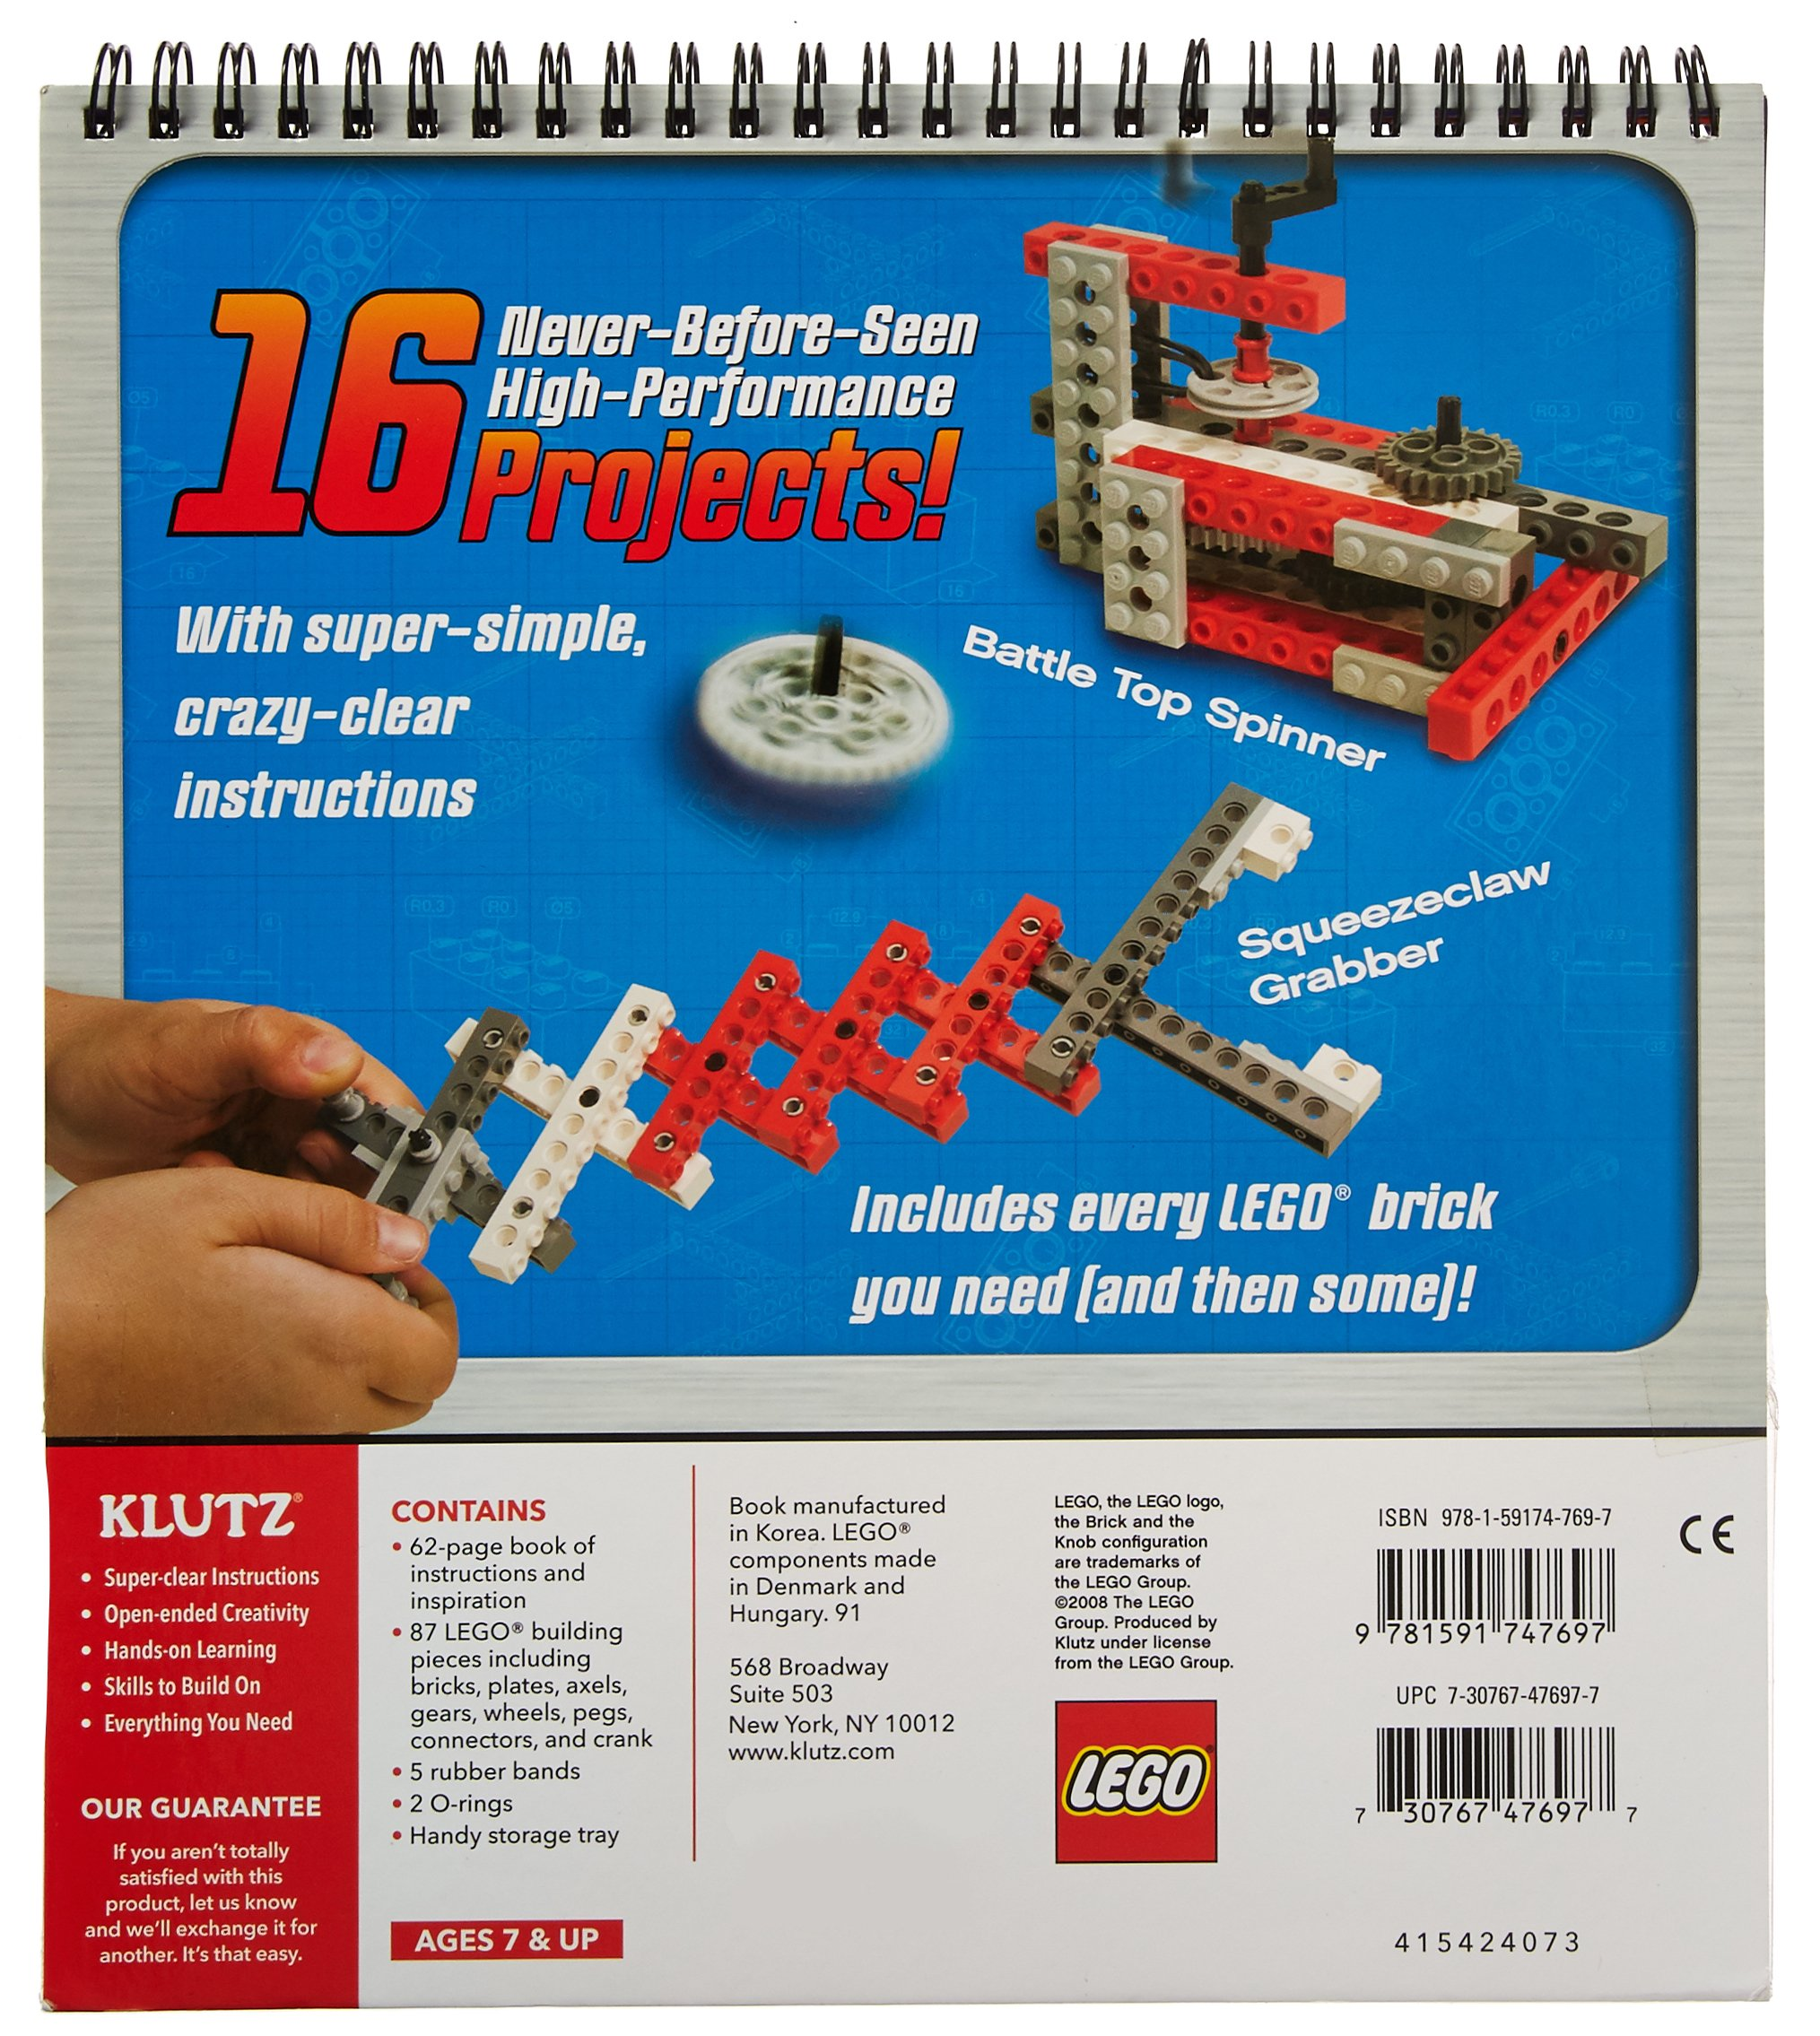 Lego Crazy Action Contraptions Book Kit (Klutz): Amazon.co.uk: Doug ...